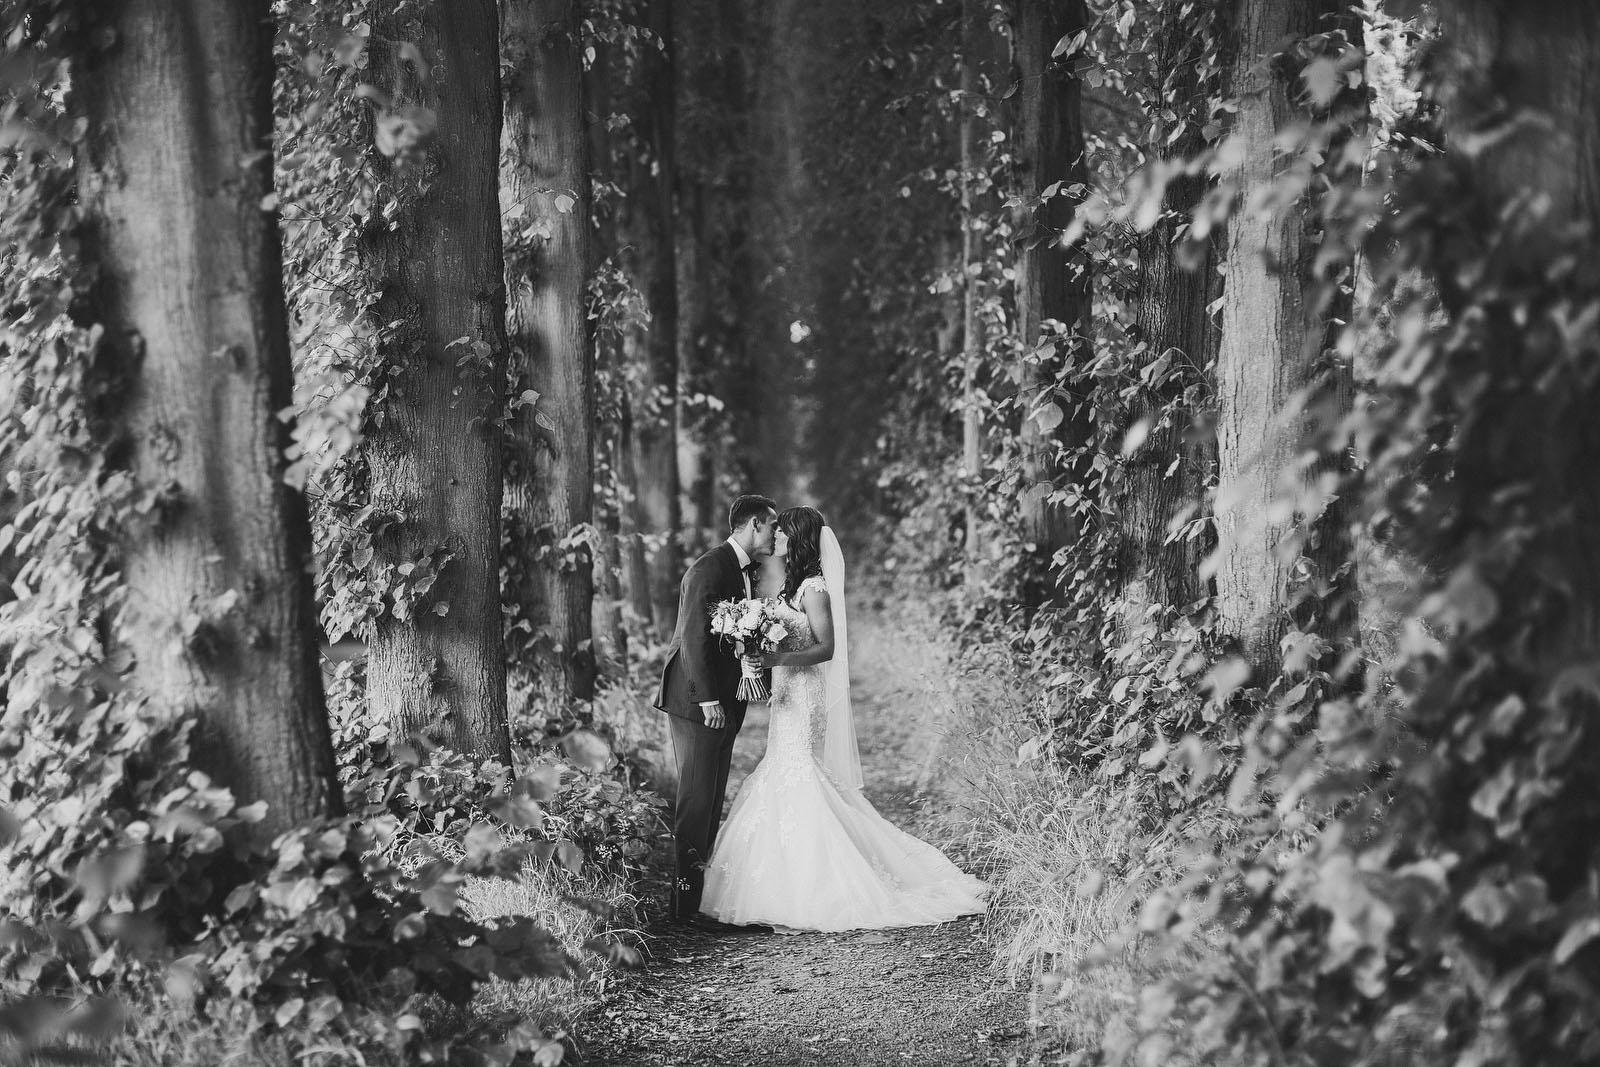 weddings at Wentworth1